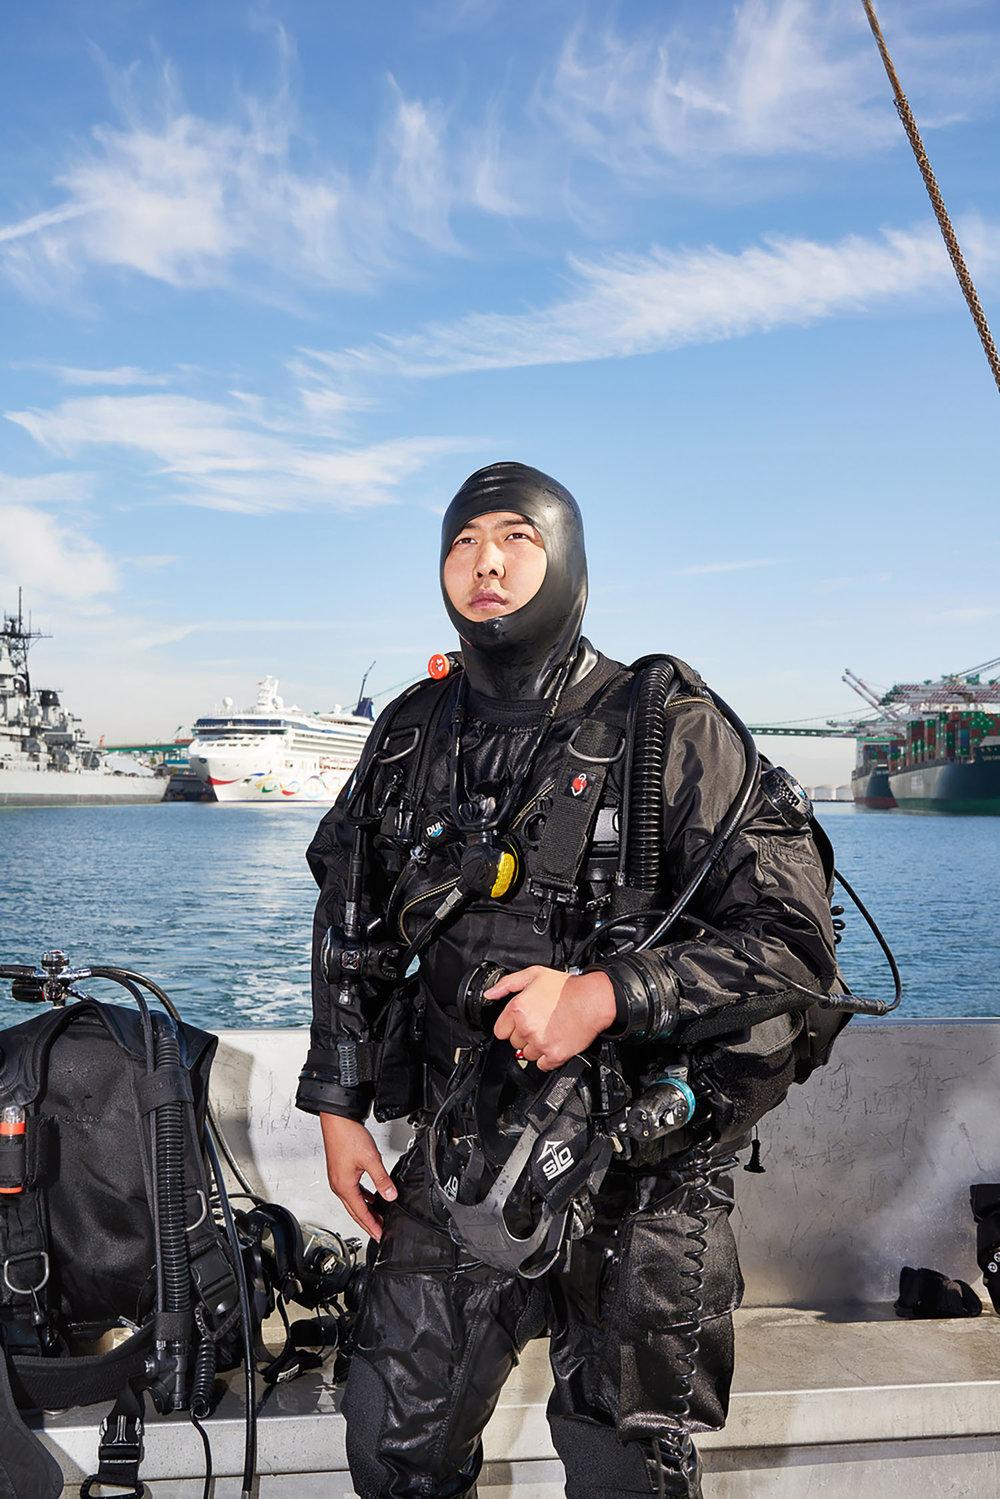 Frank Huan, Los Angeles Port Police Diver, San Pedro, California, 2015